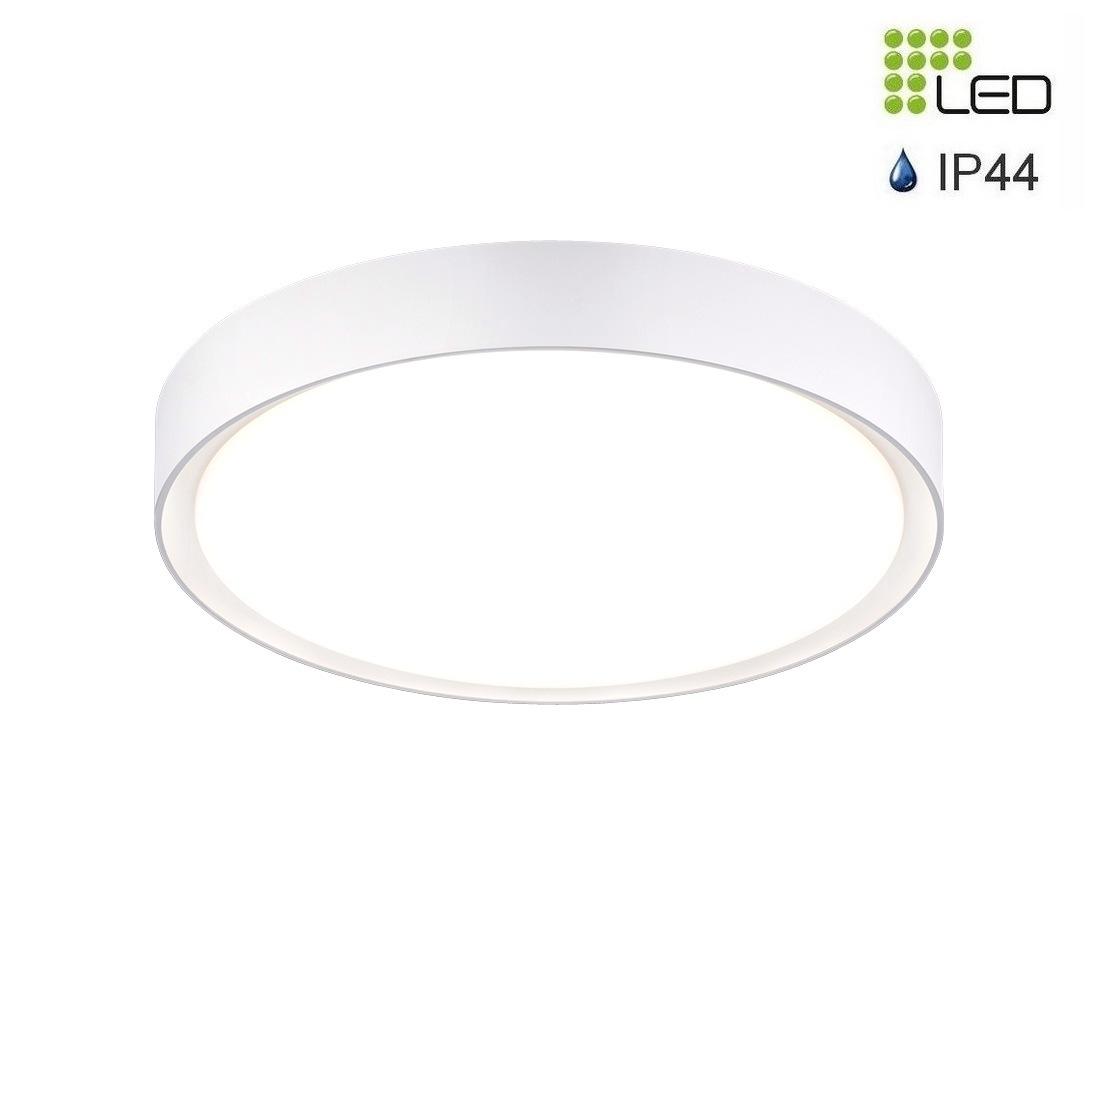 Plafonnier LED blanc IP44 18W  1600 lumens 3000aK 5 Bon Marché Plafonnier Led Blanc Zzt4